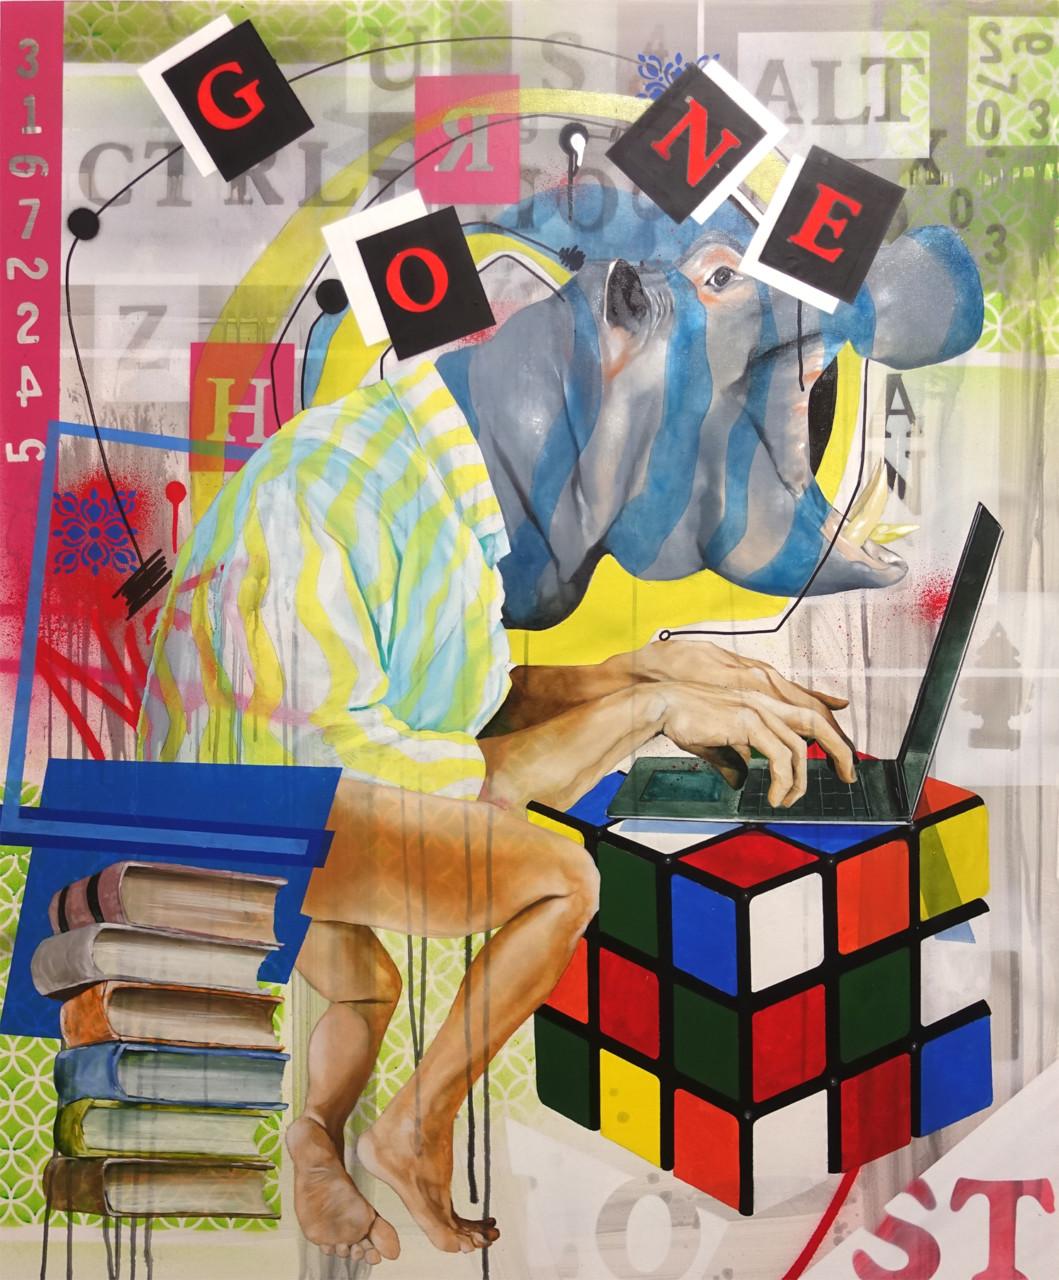 I Lost Myself, olio su tela, cm. 100x120